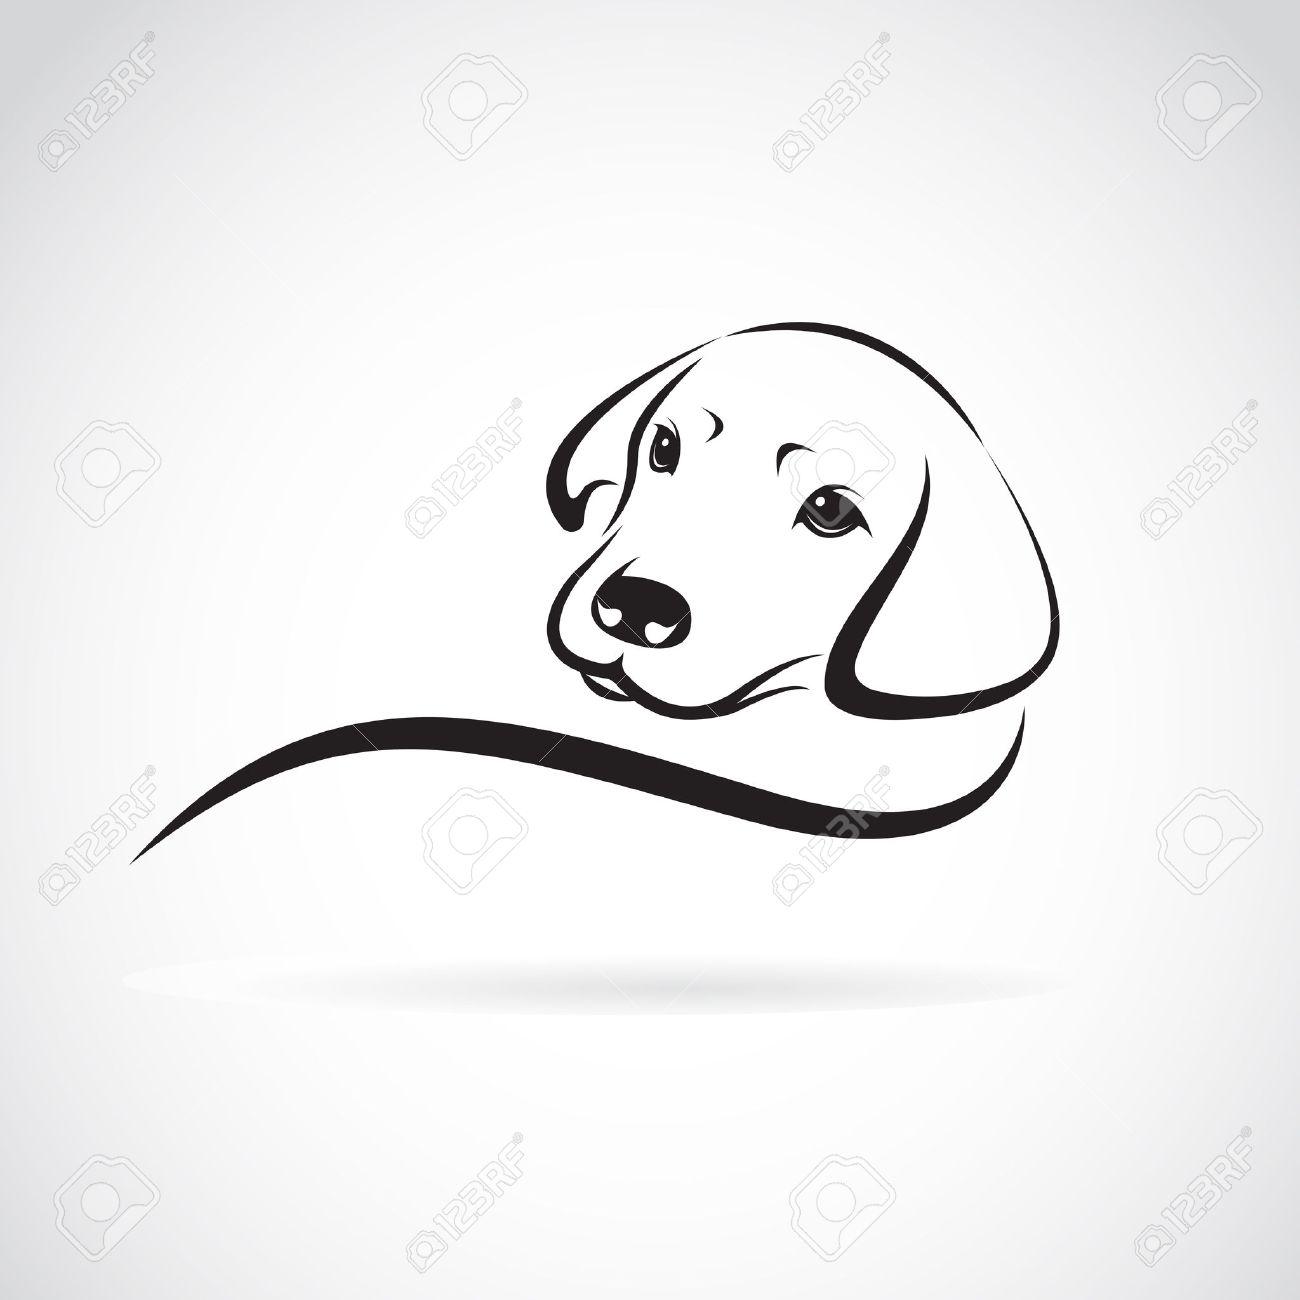 3 337 labrador retriever silhouette stock illustrations cliparts